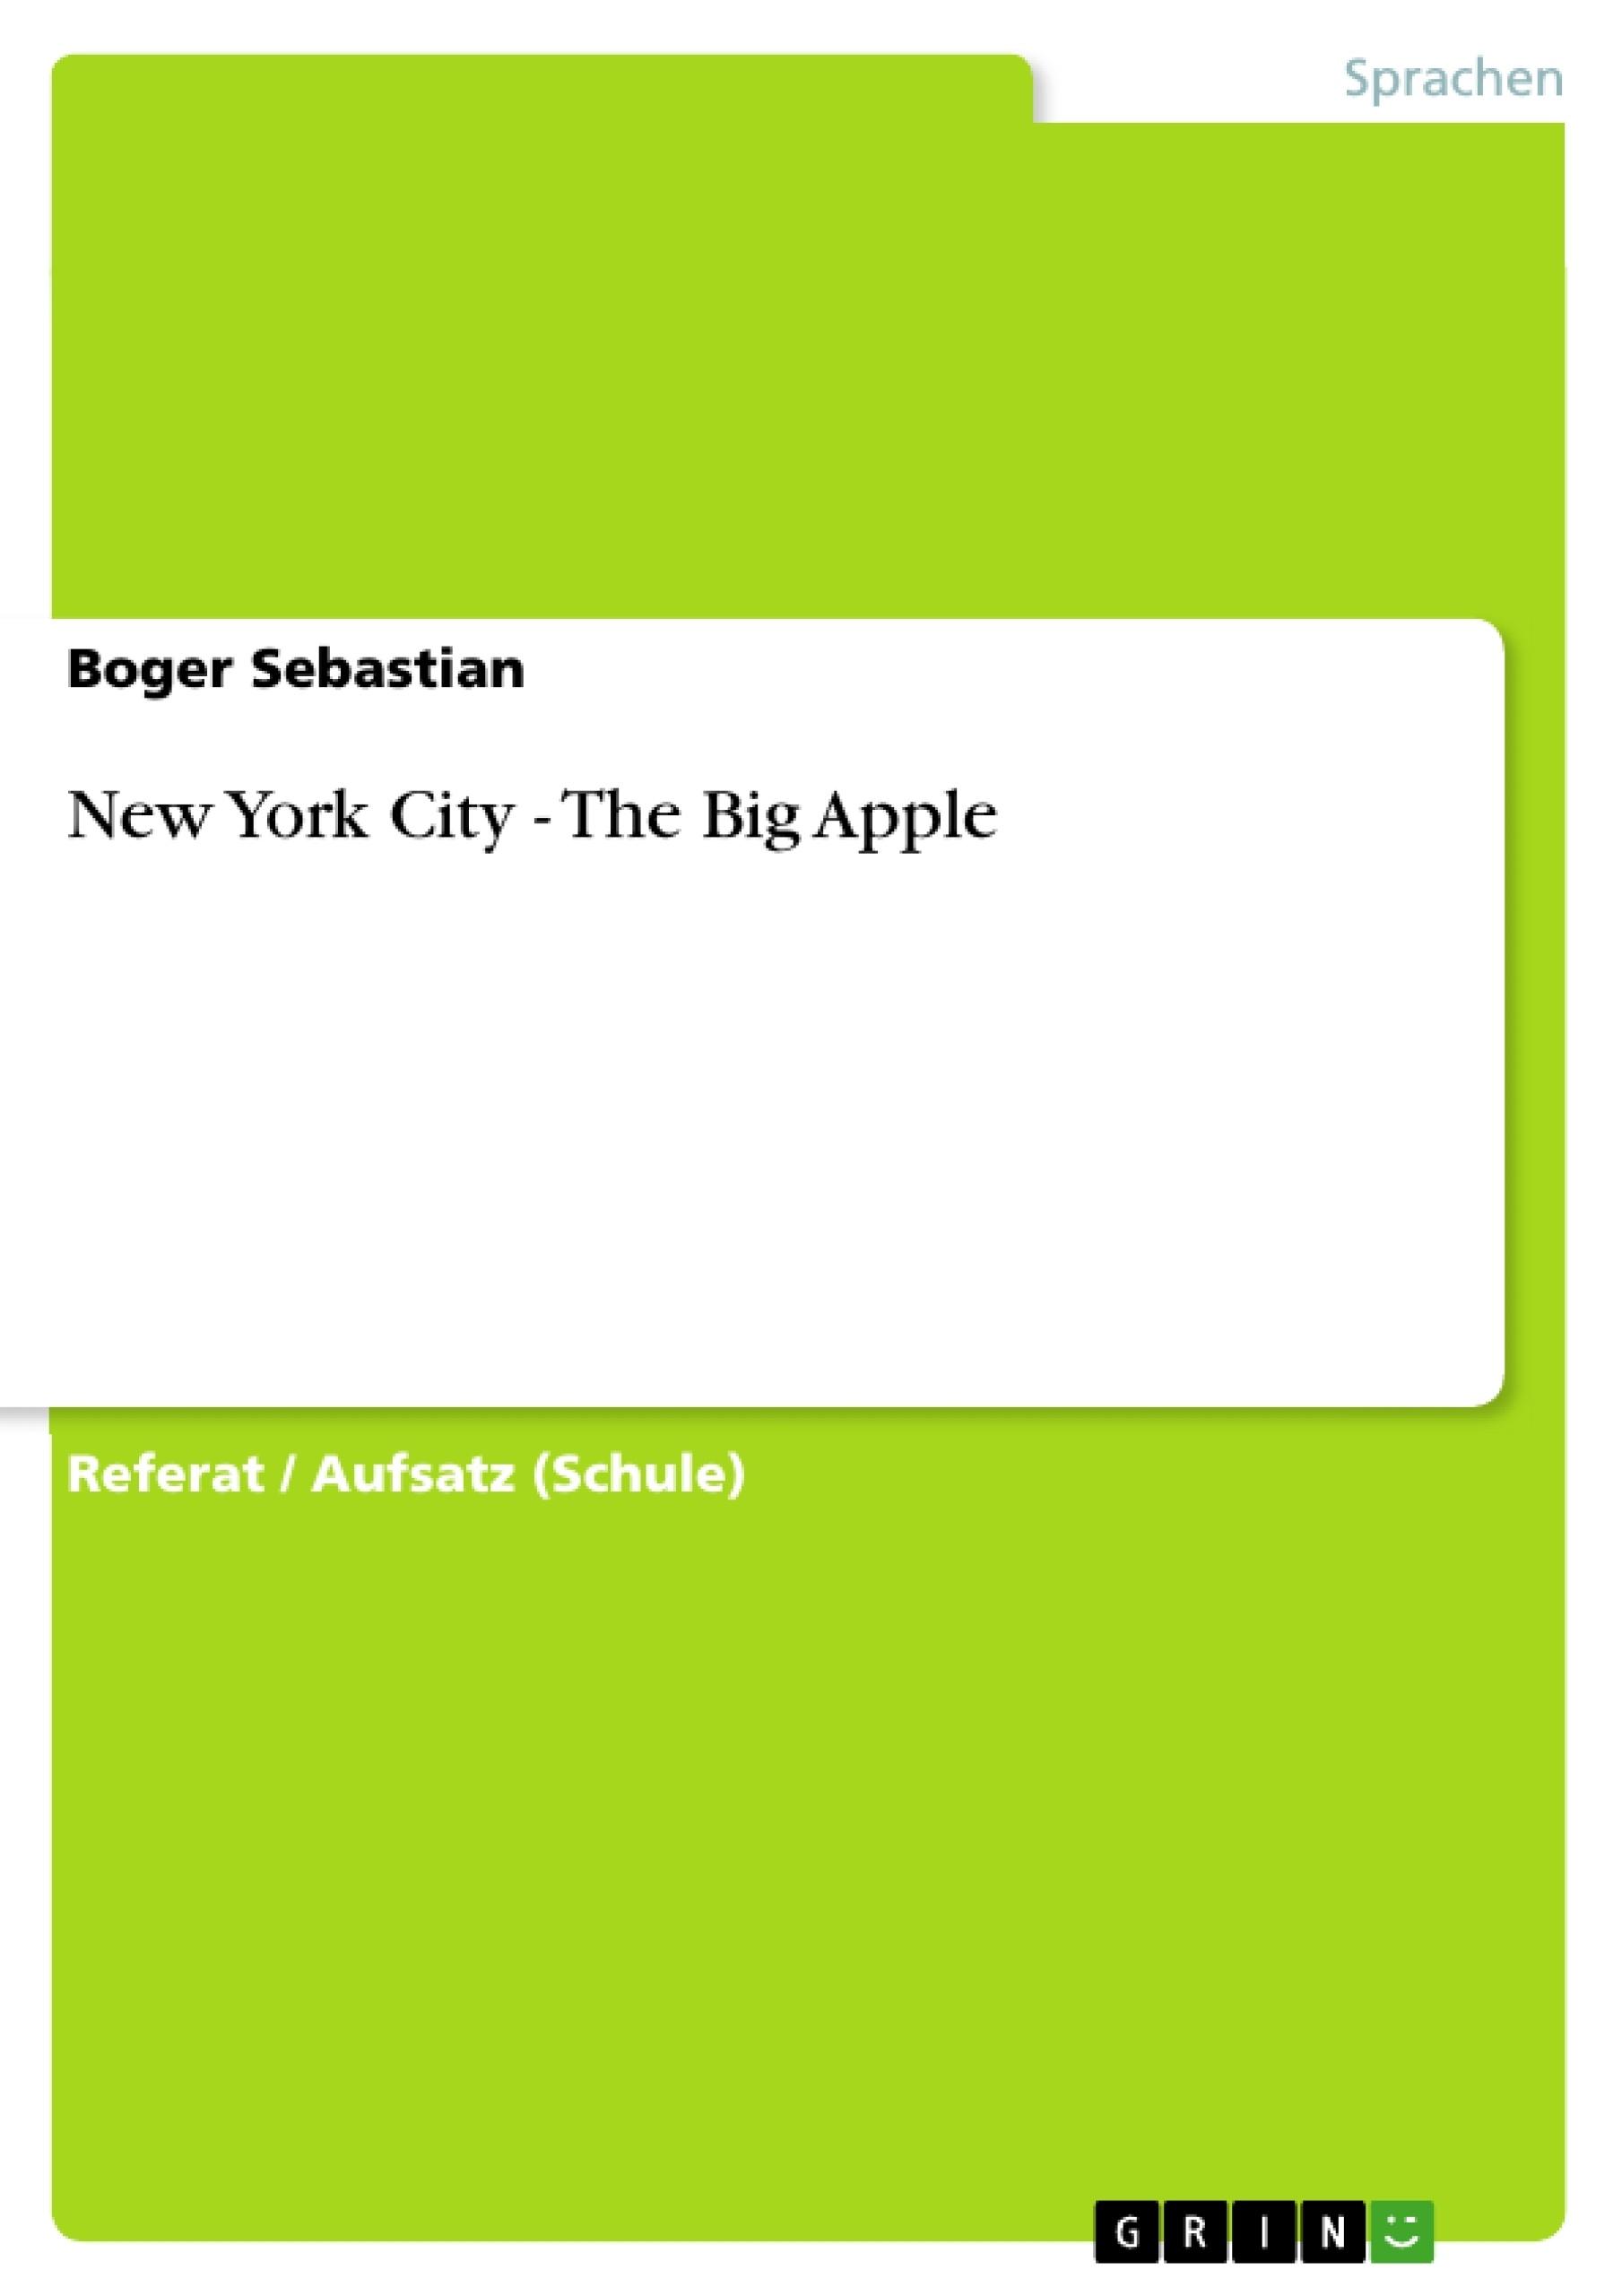 Titel: New York City - The Big Apple